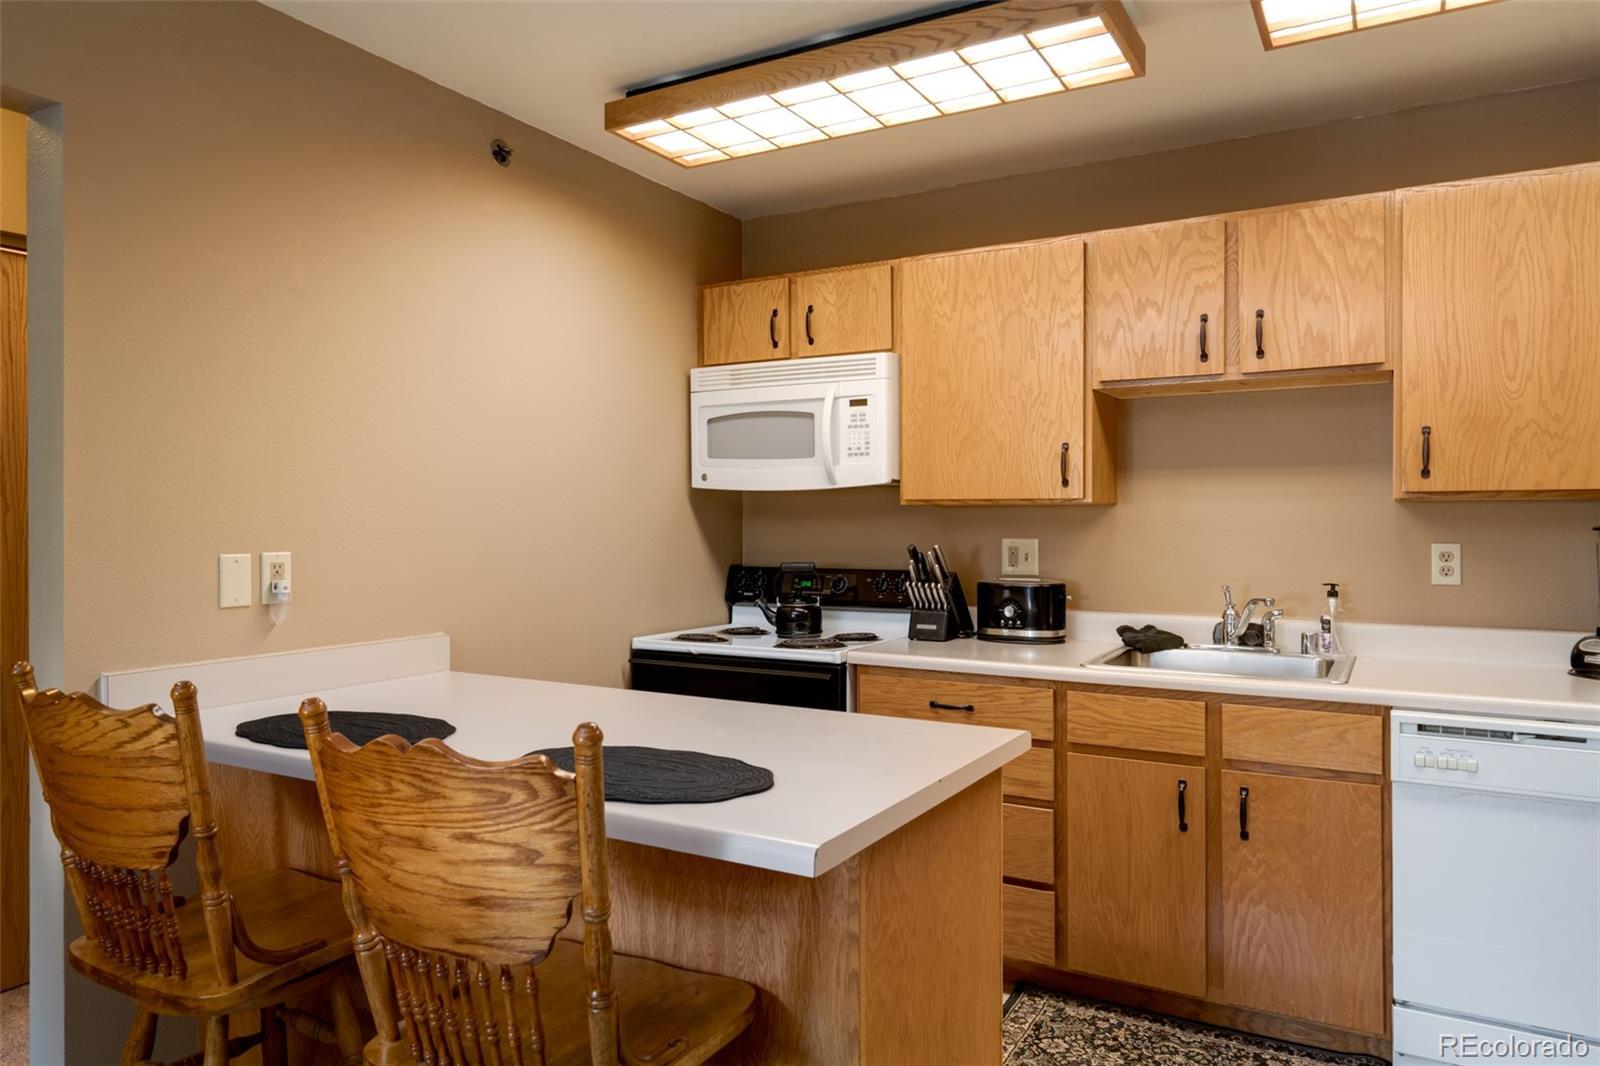 MLS# 5816259 - 7 - 1385 Sparta Plaza #7, Steamboat Springs, CO 80487